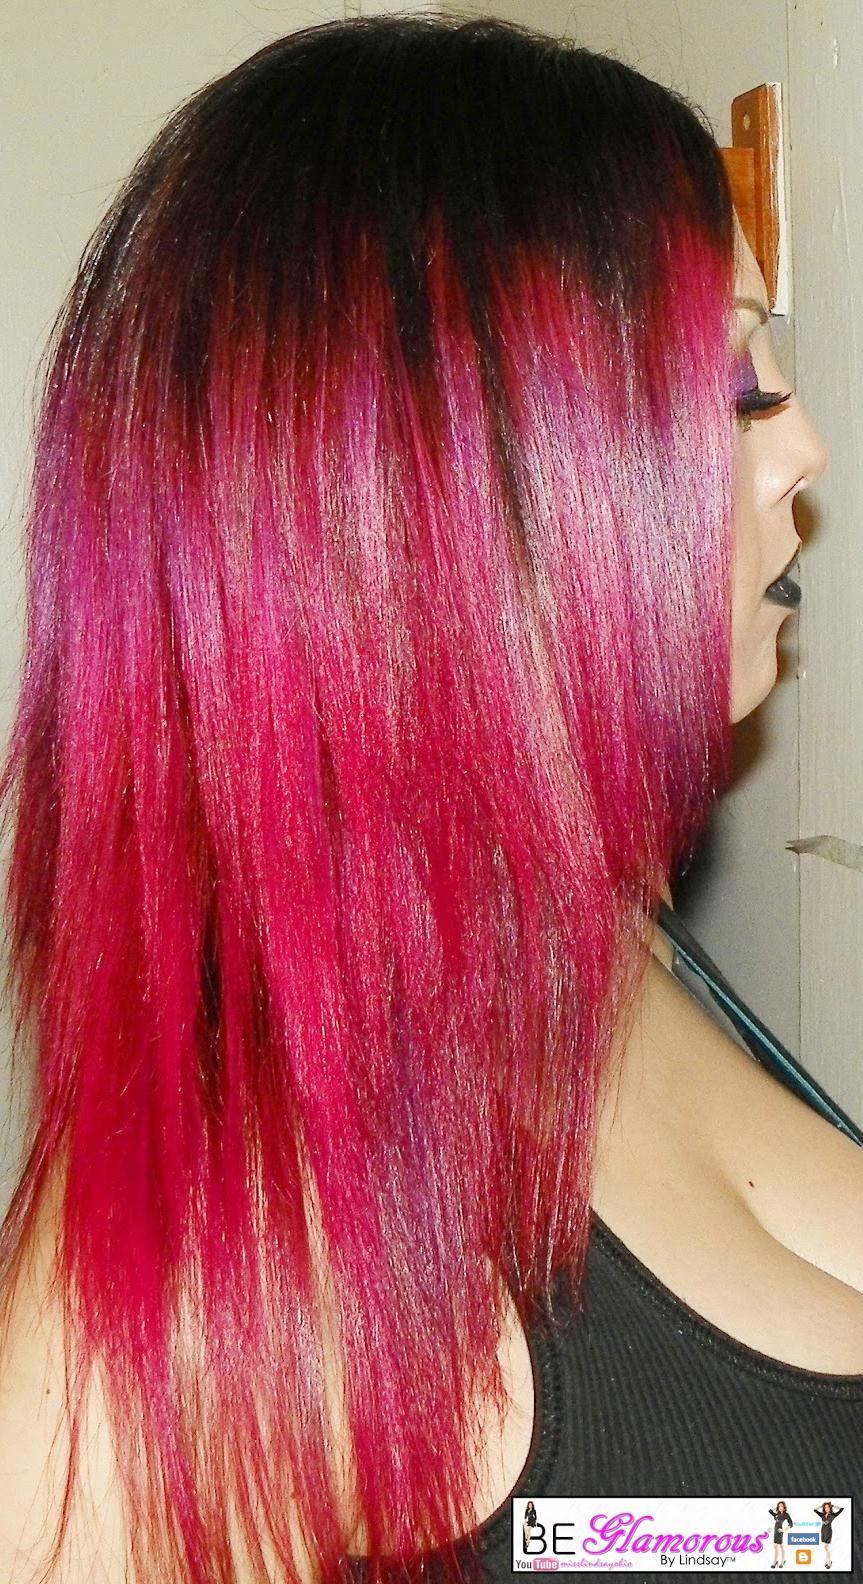 25 Ombr Hair Tutorials